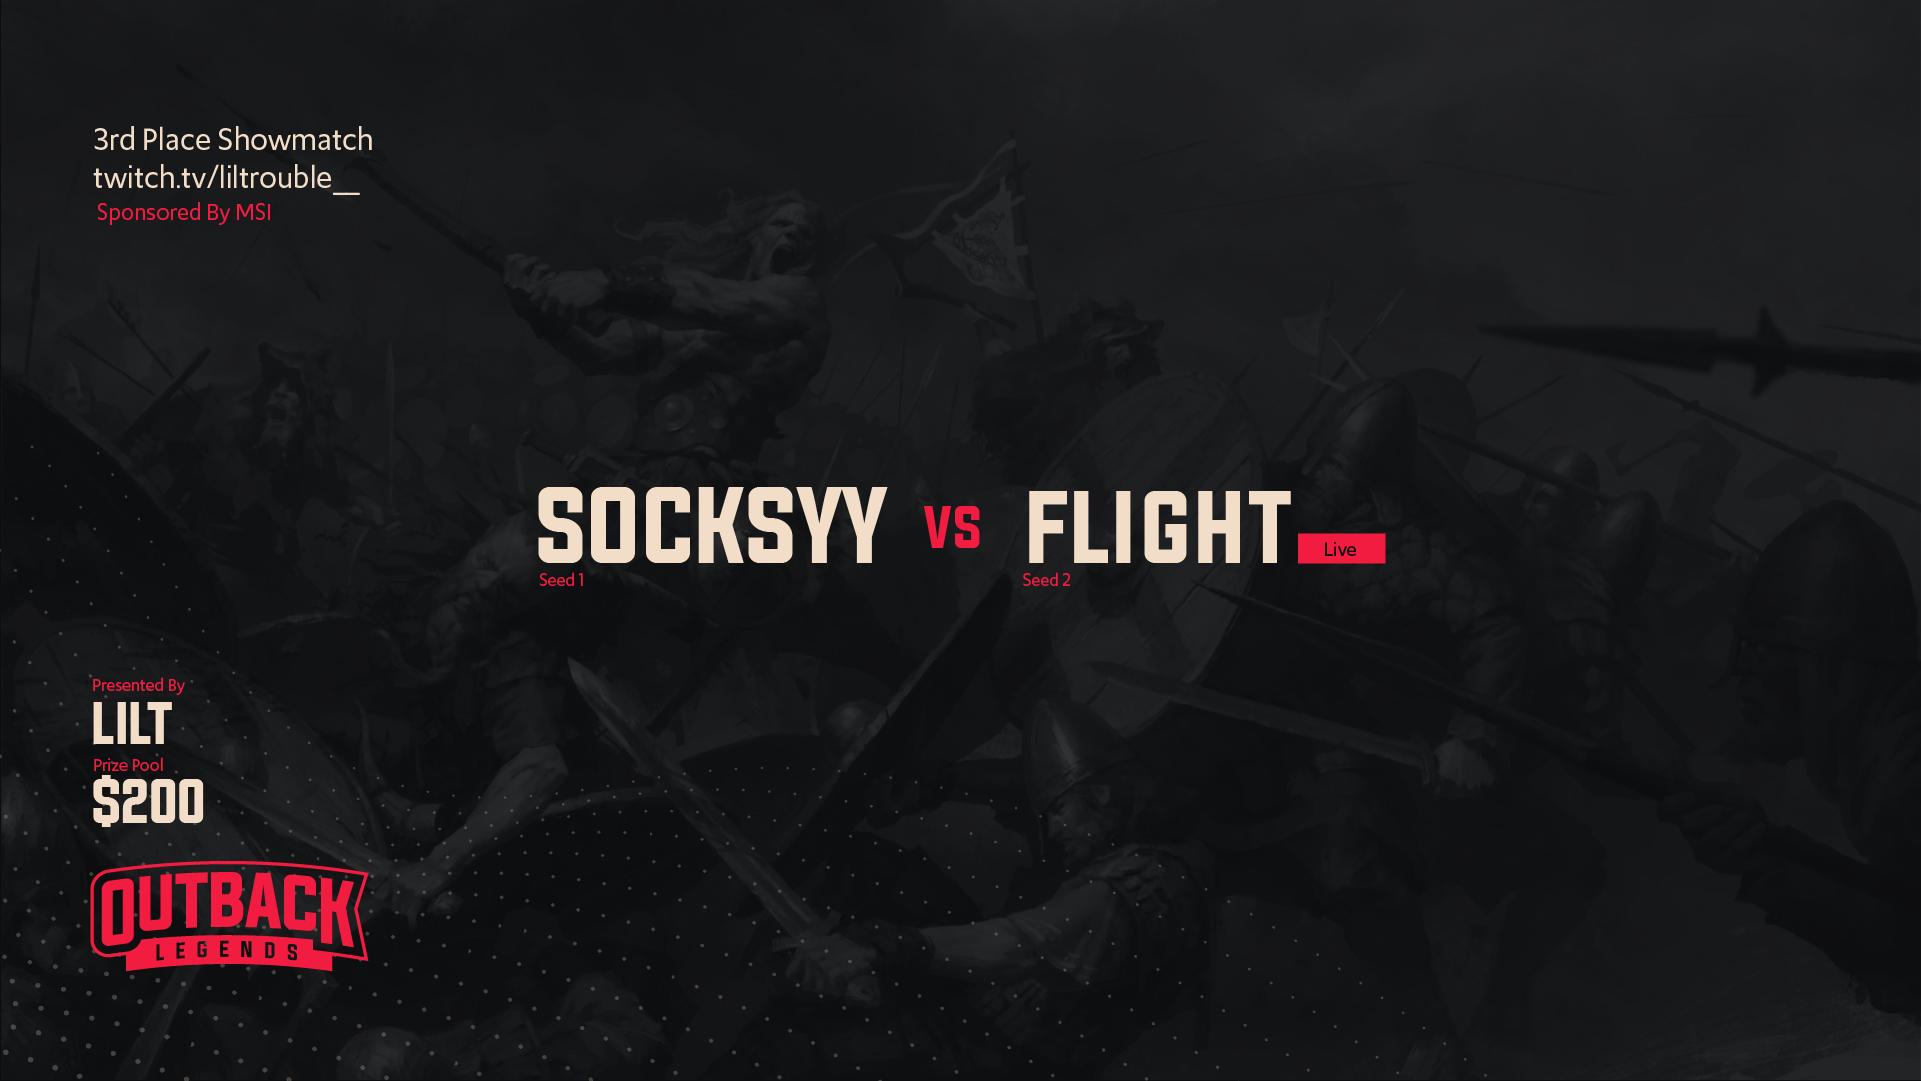 OL_showmatch_socksyy_flight-25.png